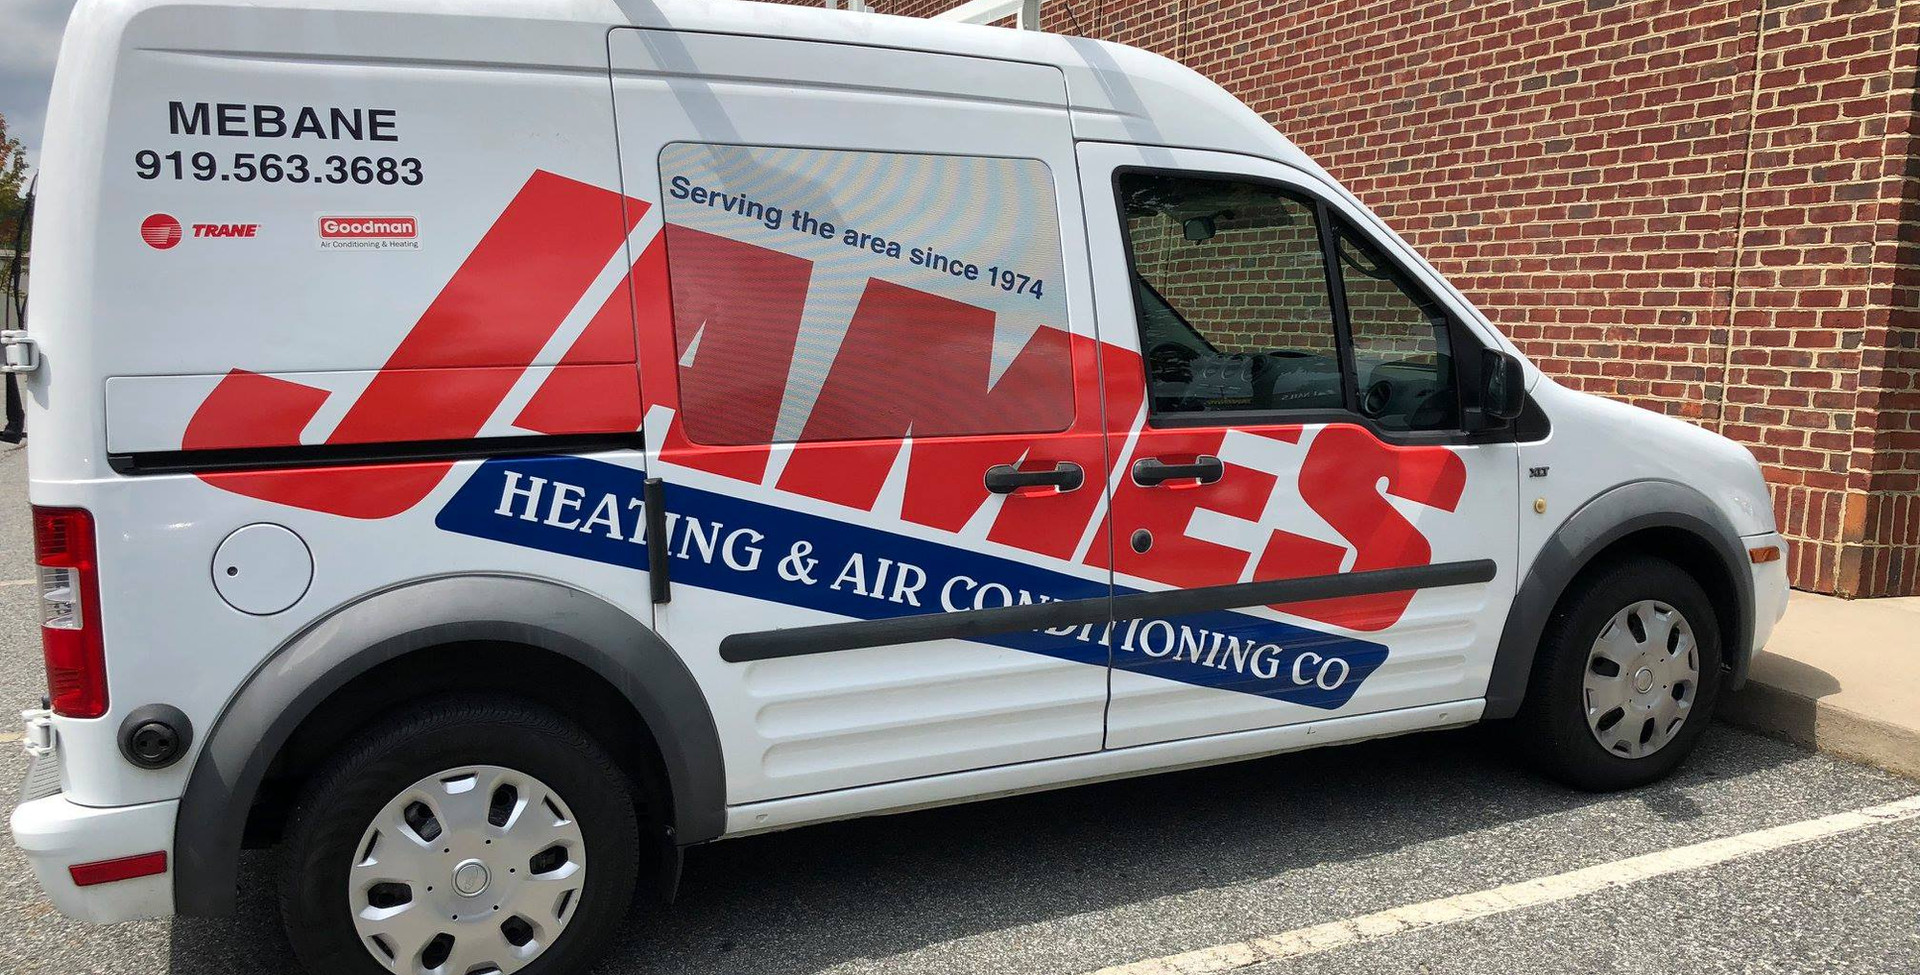 James Heating & Air